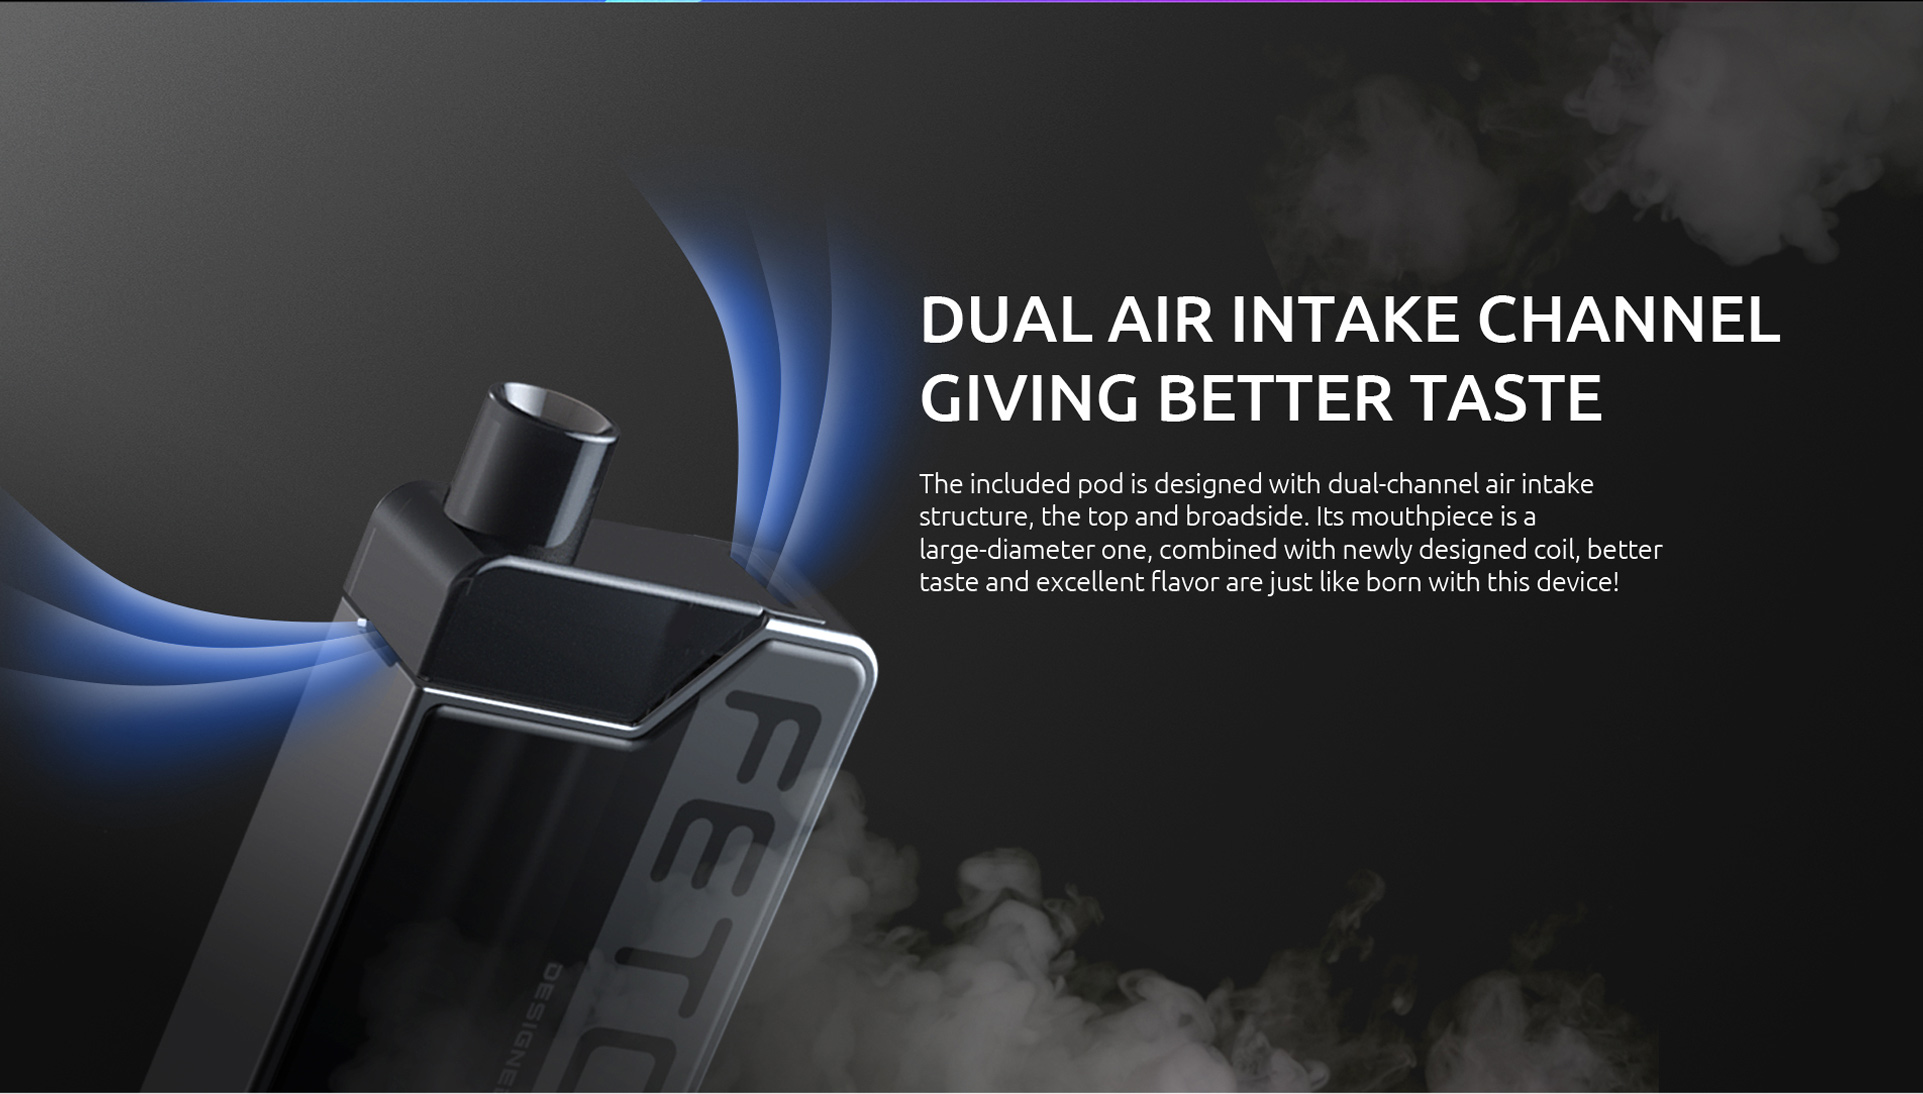 Dual Air Intake Channel Design of SMOK Fetch Mini